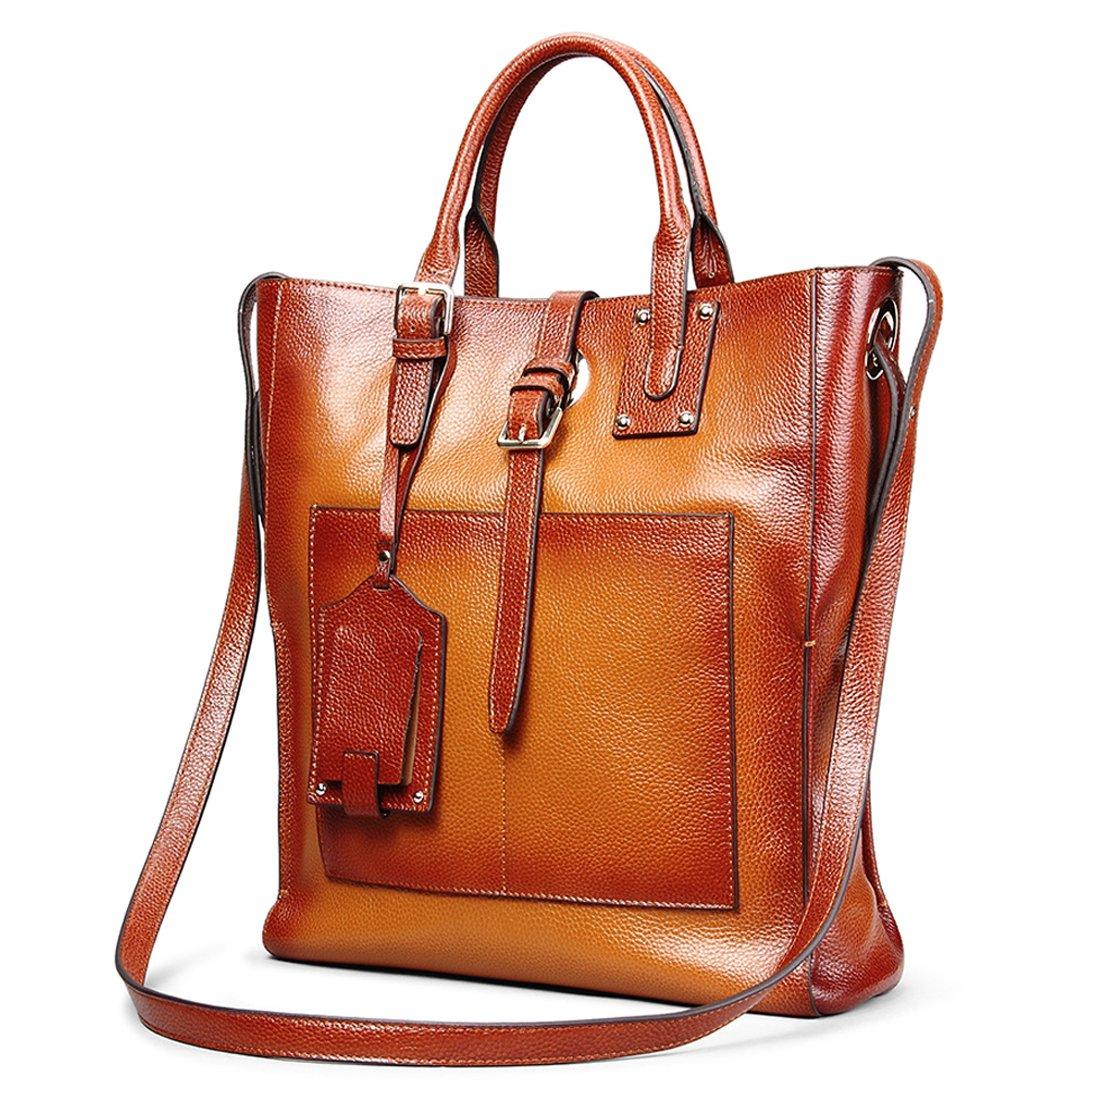 AINIMOER Women's Genuine Leather Tote Handle Bag Cross-body Handbag Top Handle Shoulder Bags(Sorrel-L)